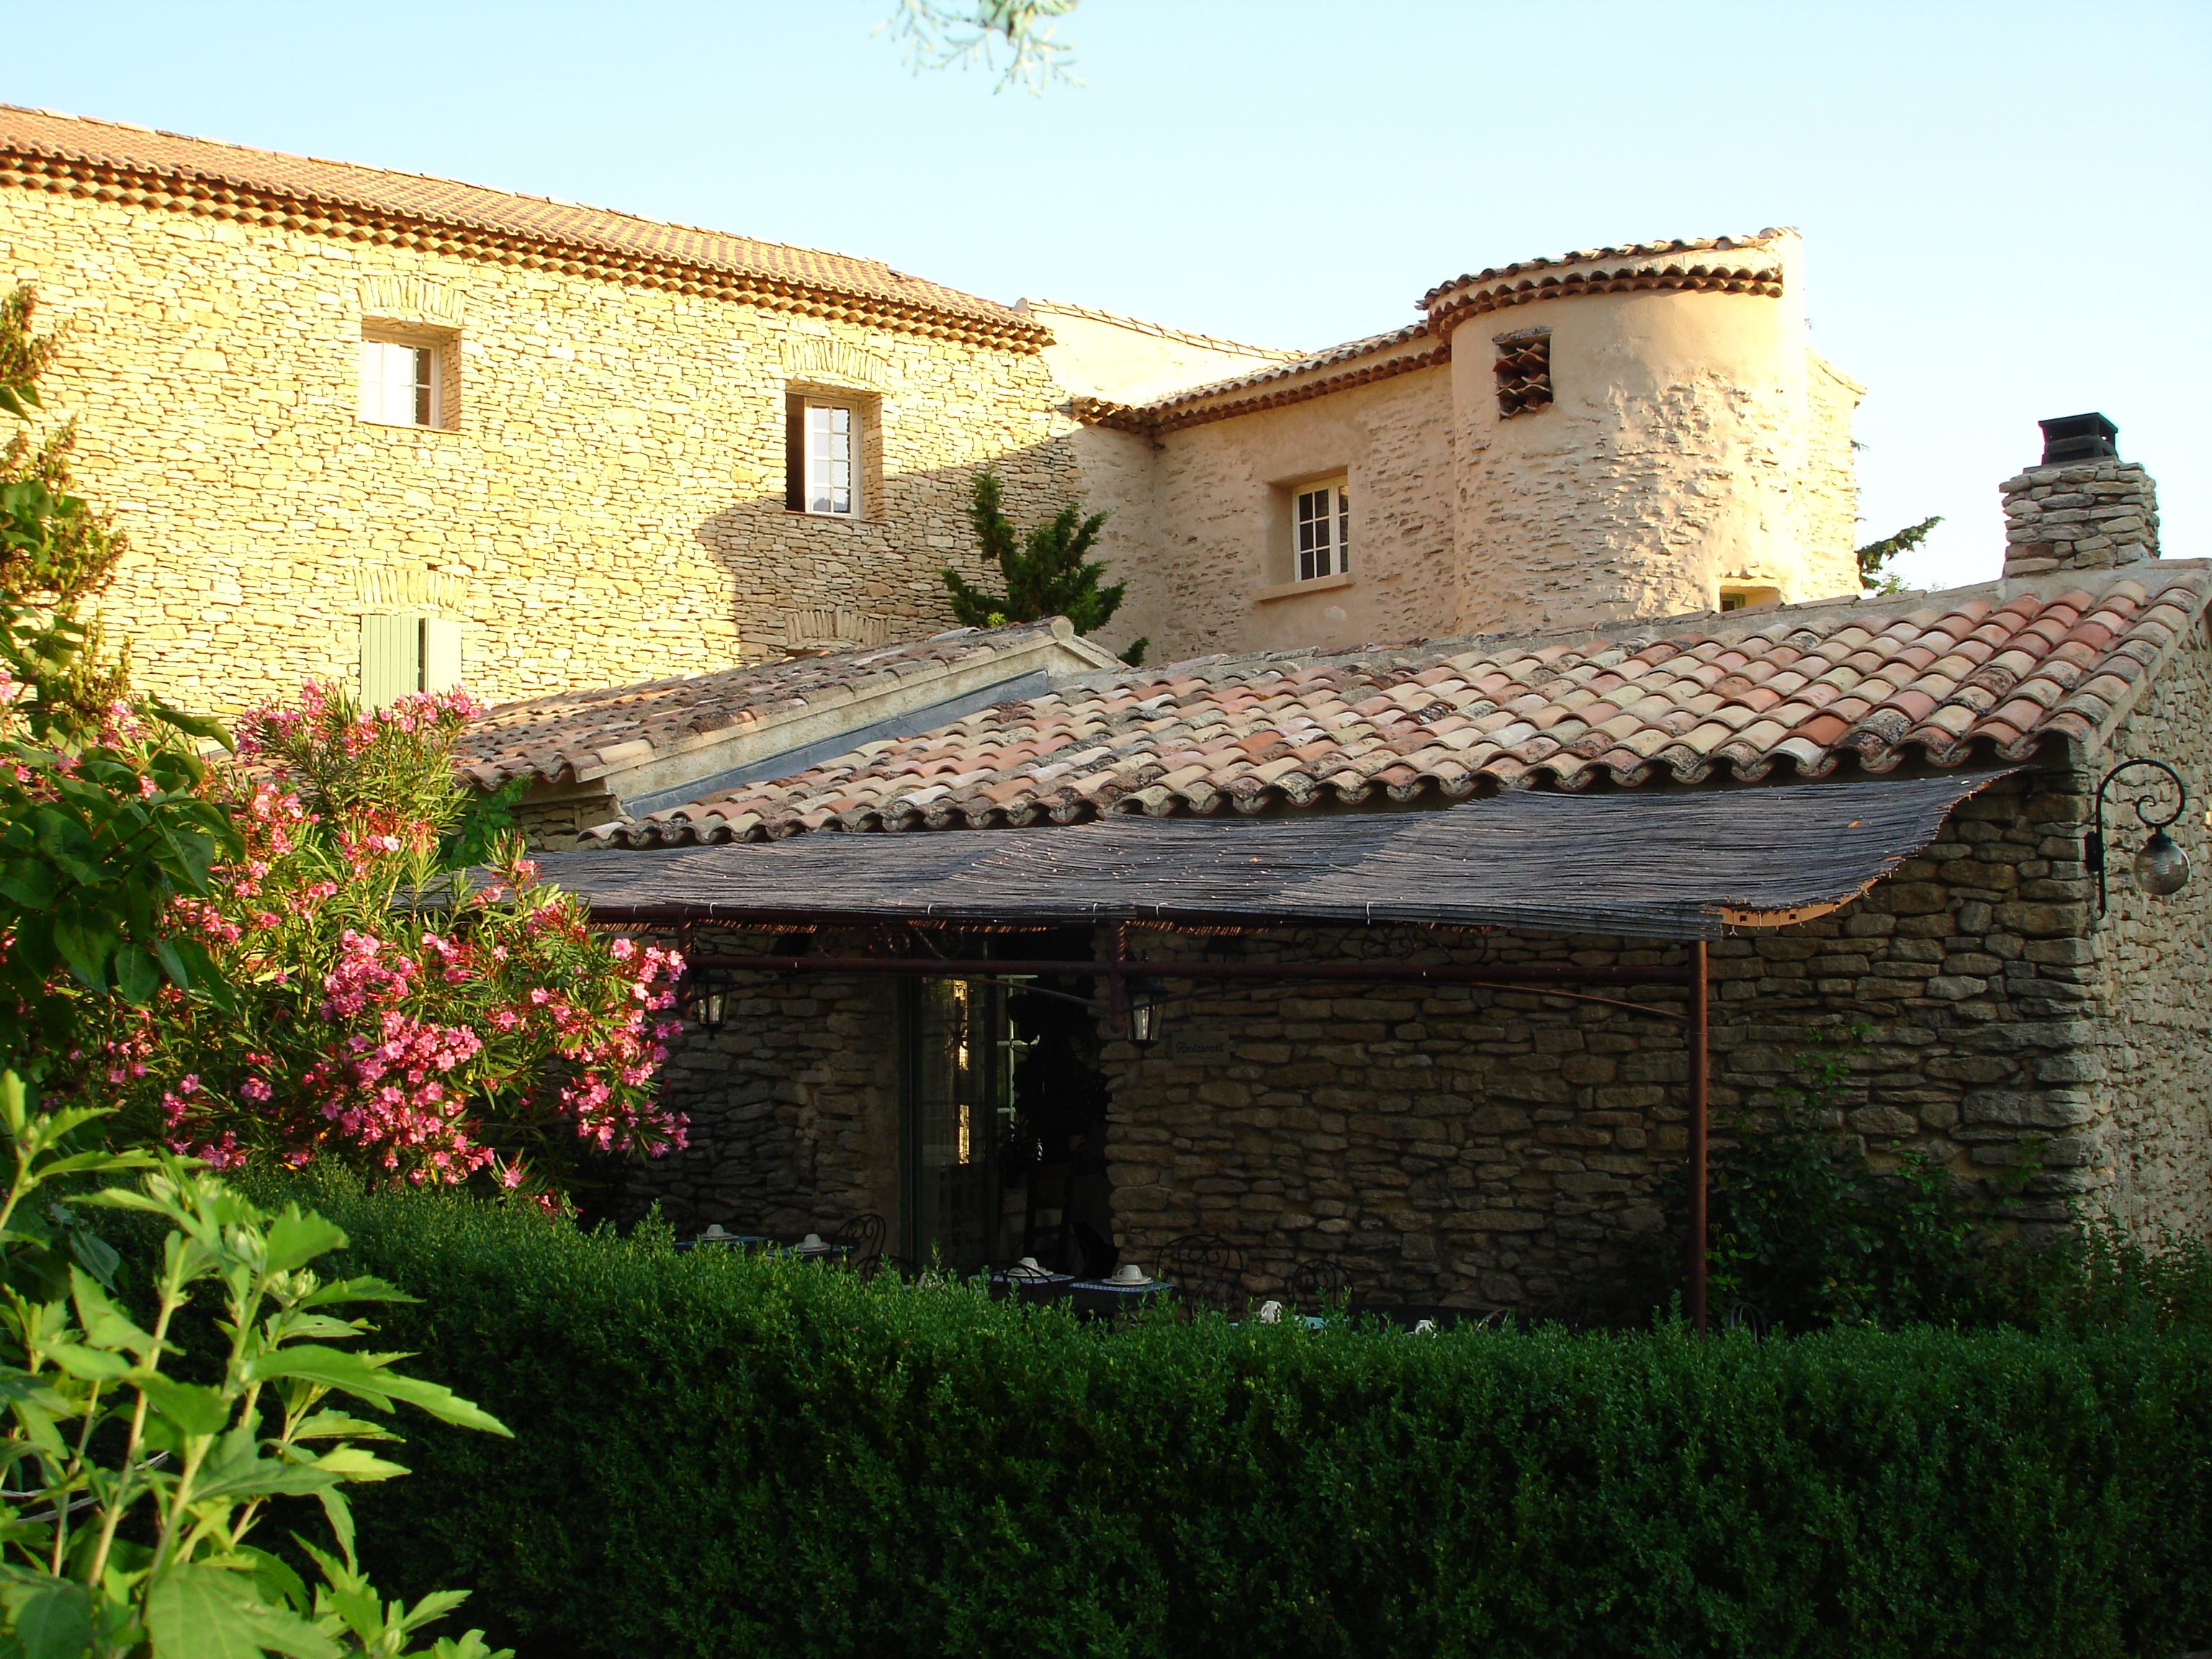 restaurant fran§ais La Villa du Roque La Roque Gageac